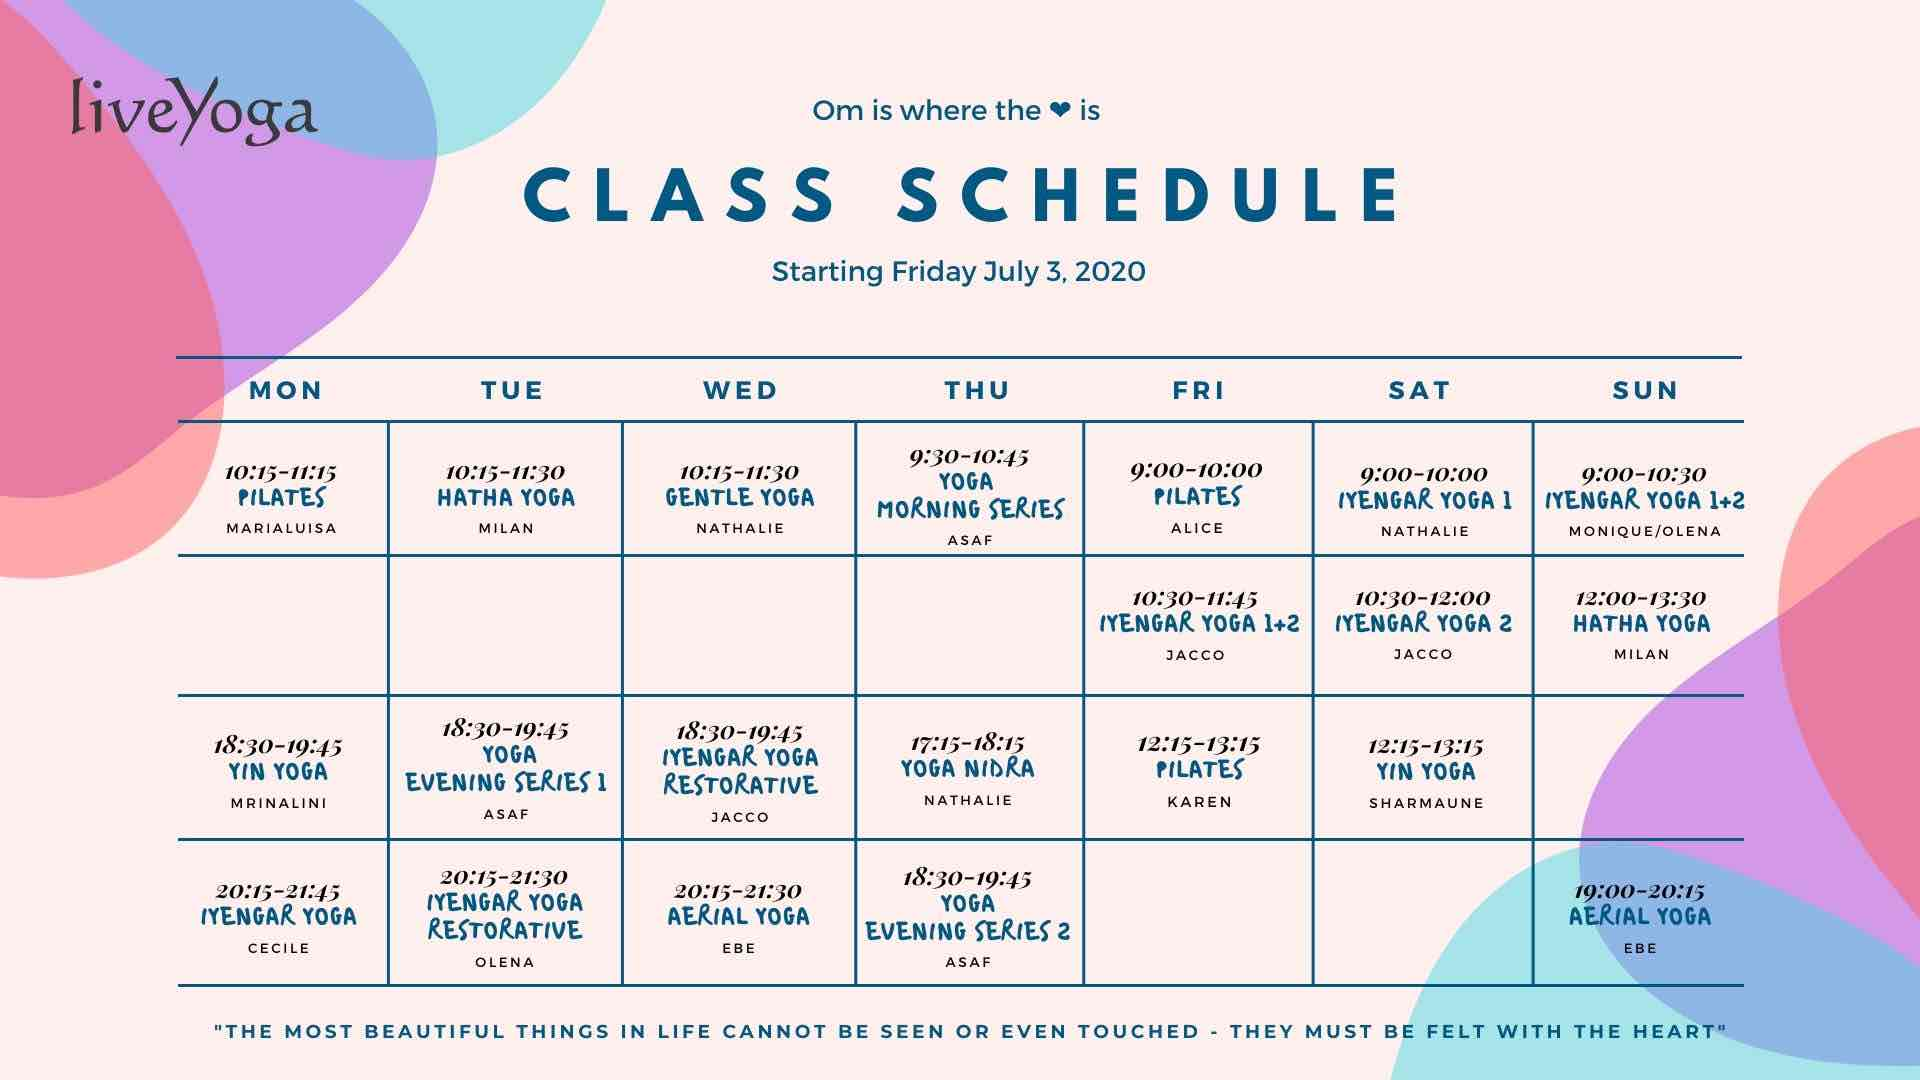 class schedule liveyoga amsterdam